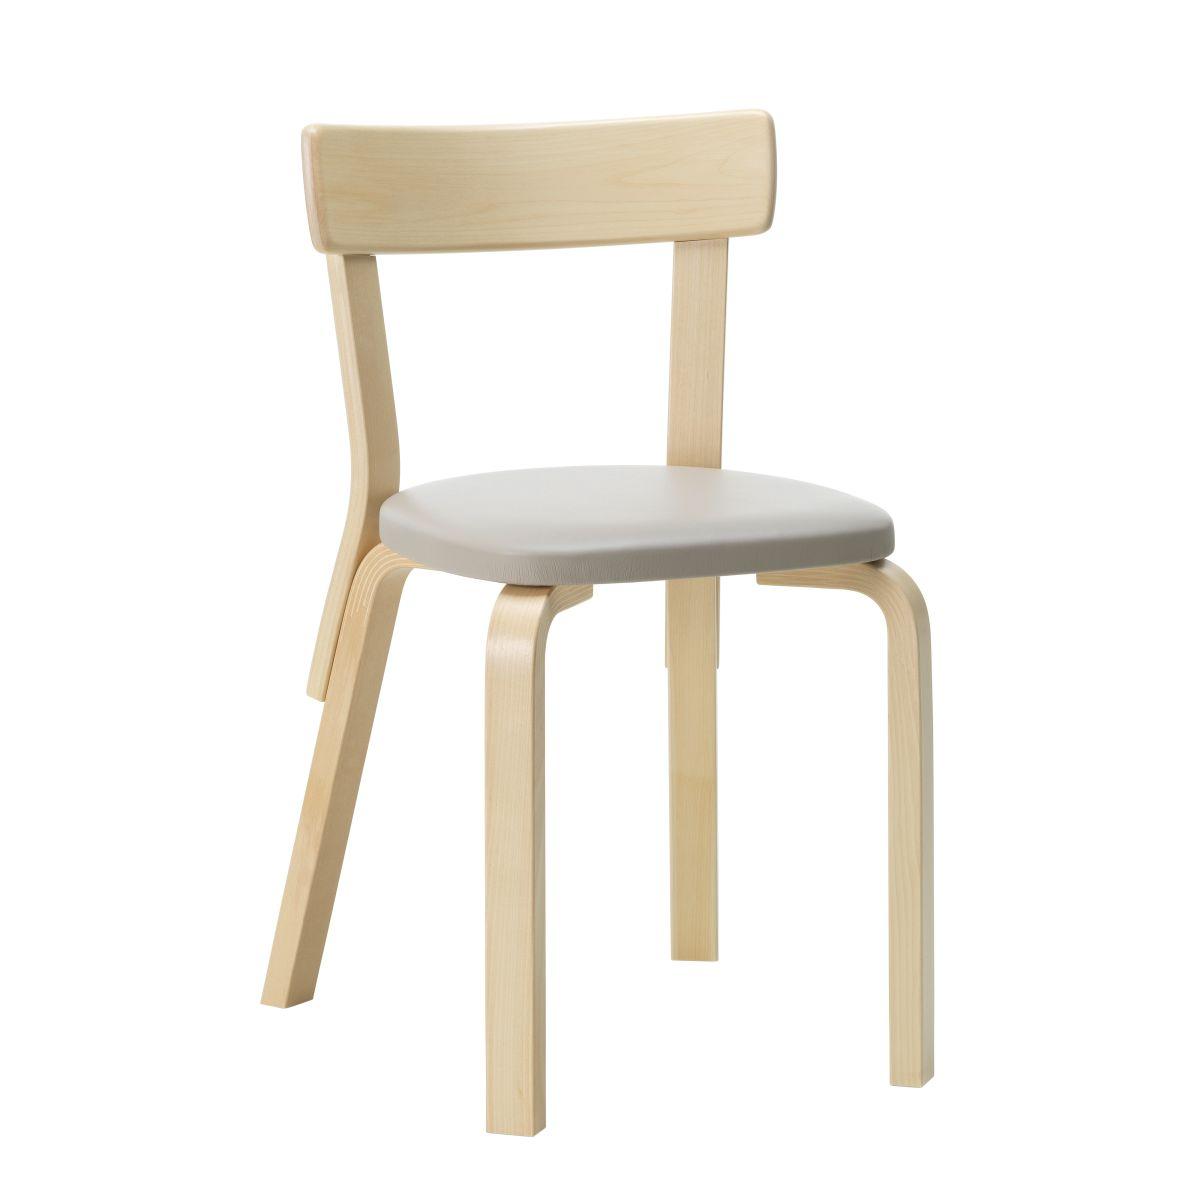 Chair-69-natural-upholstery-Sörensen-Prestige-beige_F-2868264